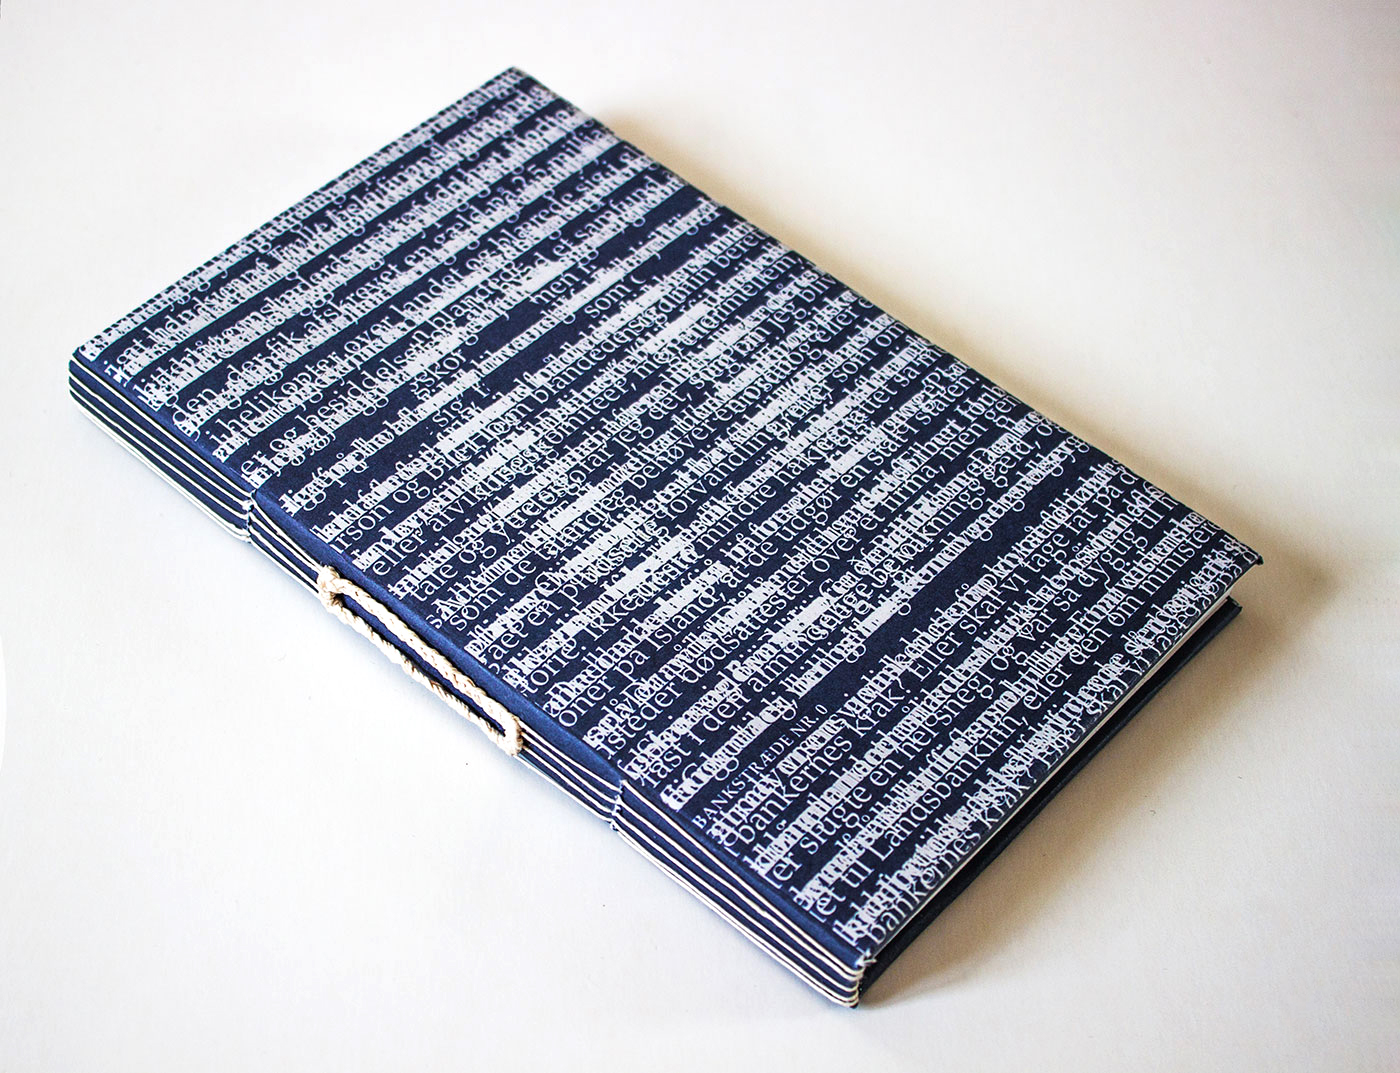 book_cover_design_artist_kunstner_graphic_designer_grafisk_designer_marie_broegger_layout_typografi_typography-4 copy